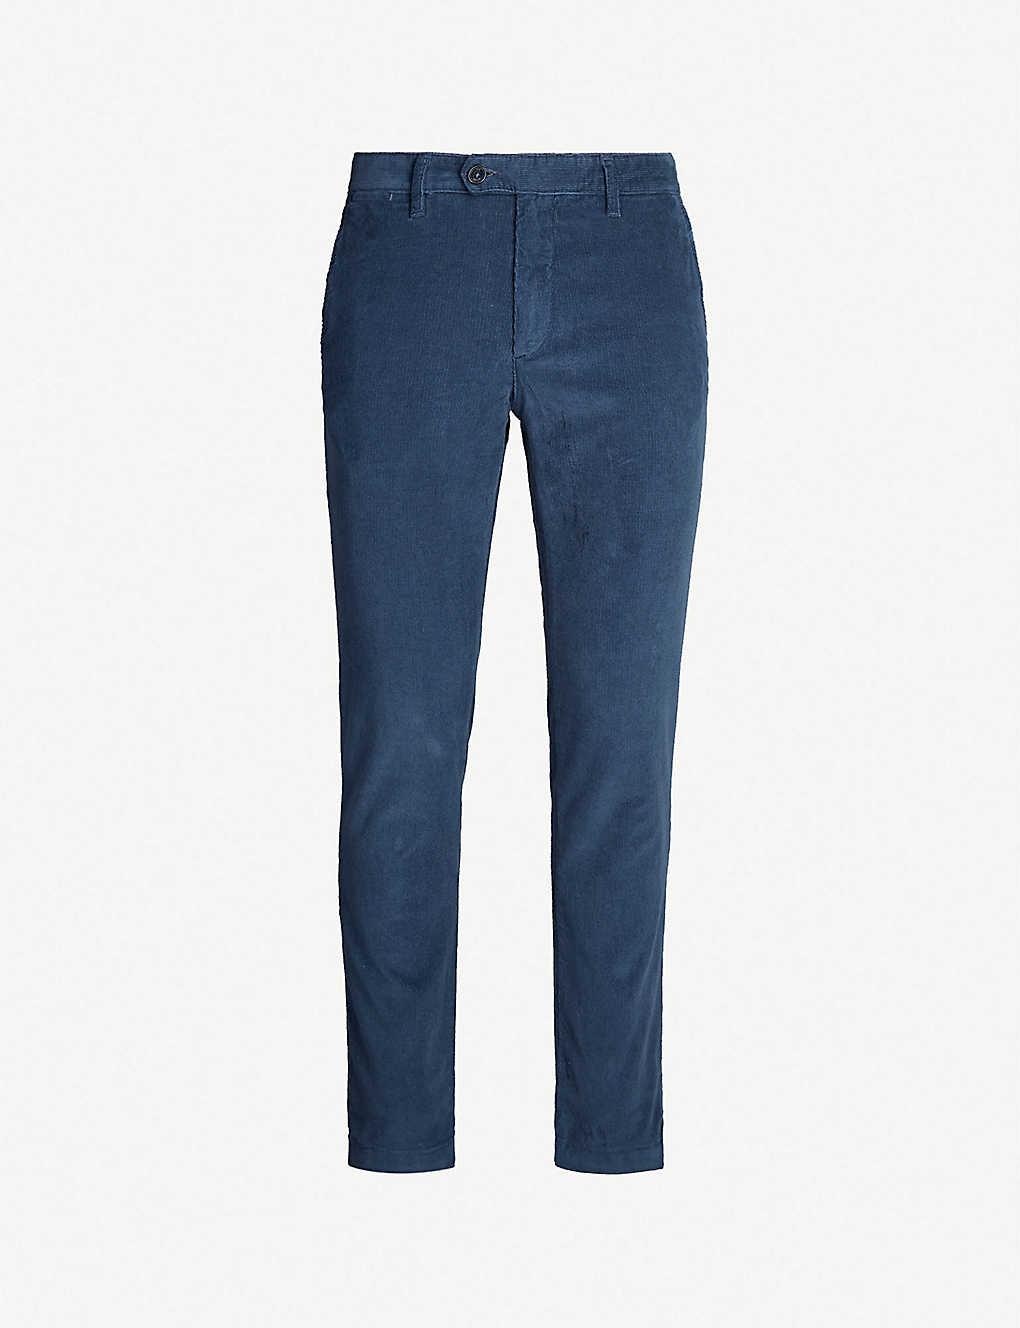 e577e75c4f5 TED BAKER - Cordtro slim-fit corduroy trousers | Selfridges.com